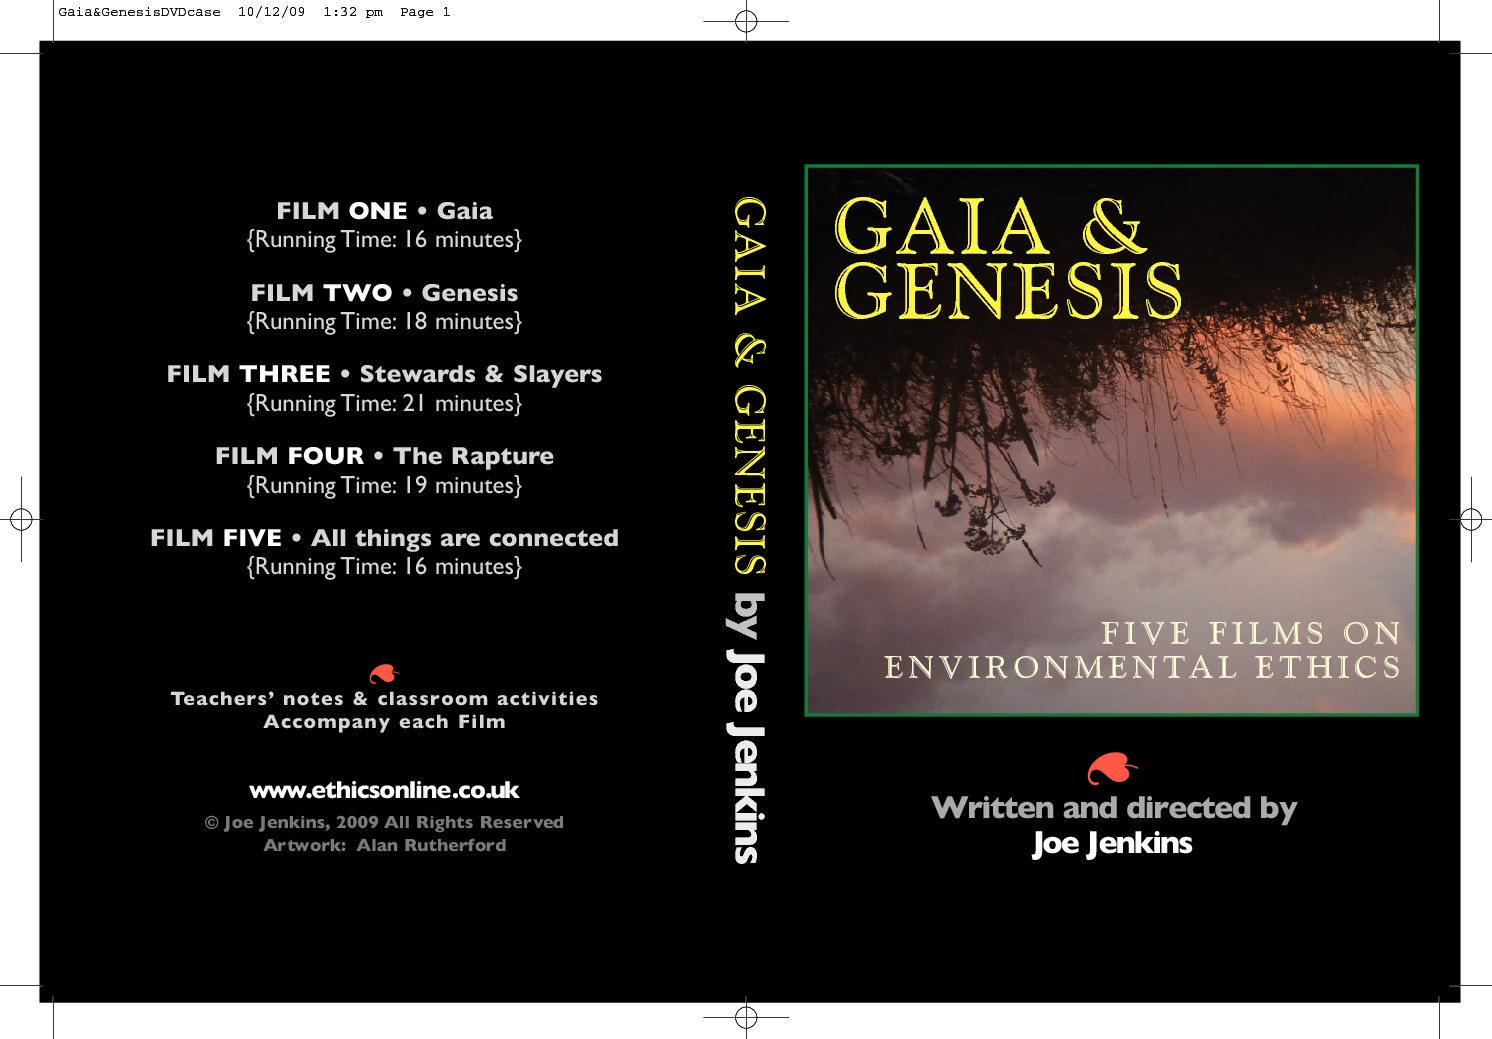 Gaia&GenesisDVDcasenew